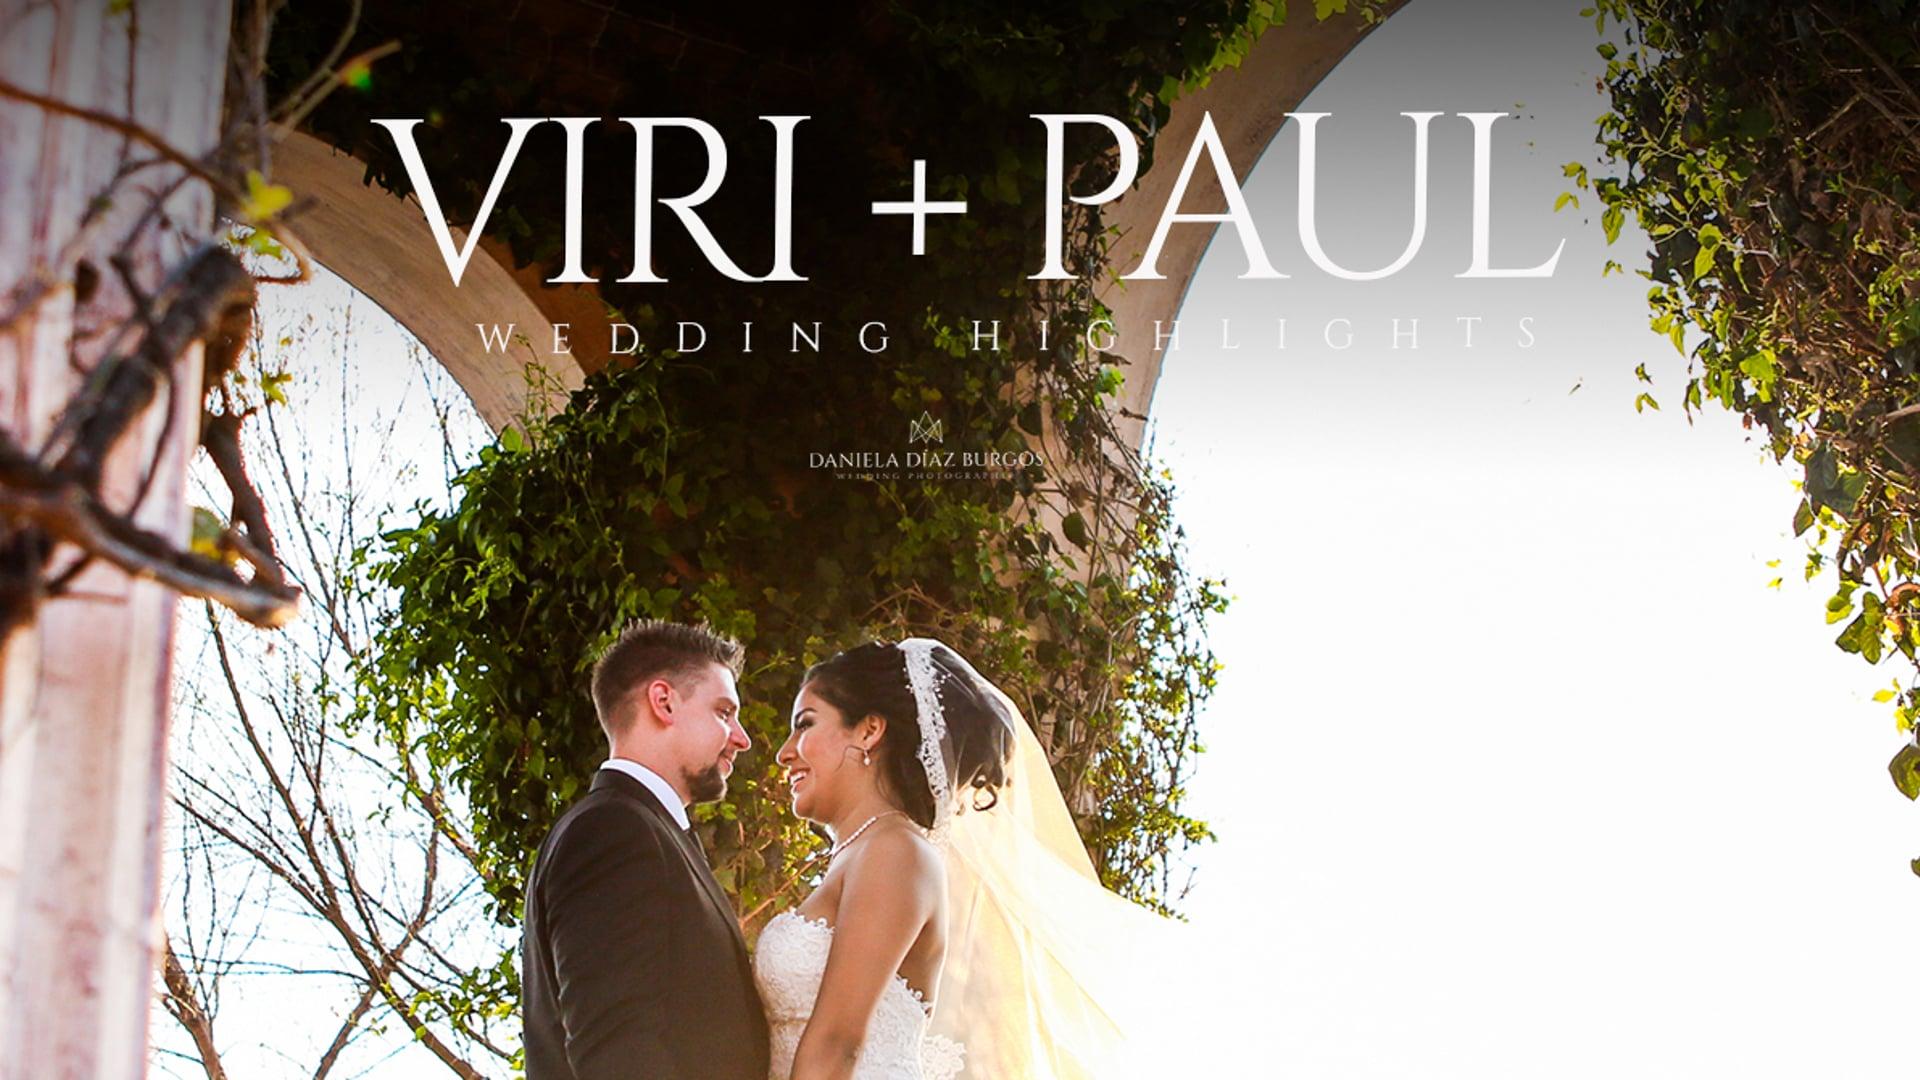 "Viri + Paul ""Wedding highlights"""